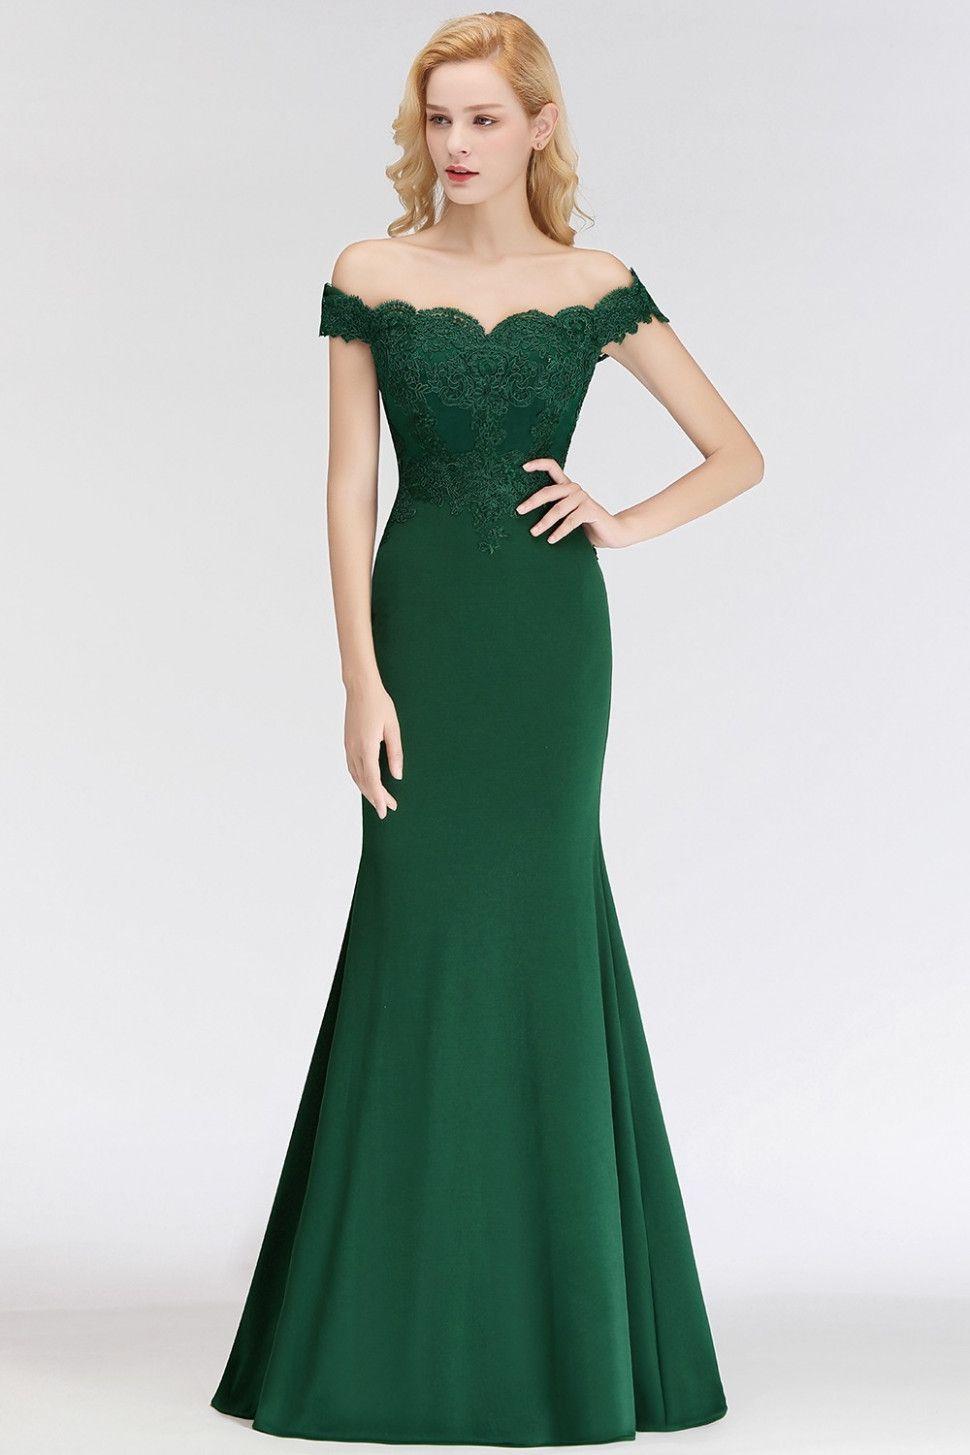 10 abendkleid lang grün | elegante brautjungfernkleider